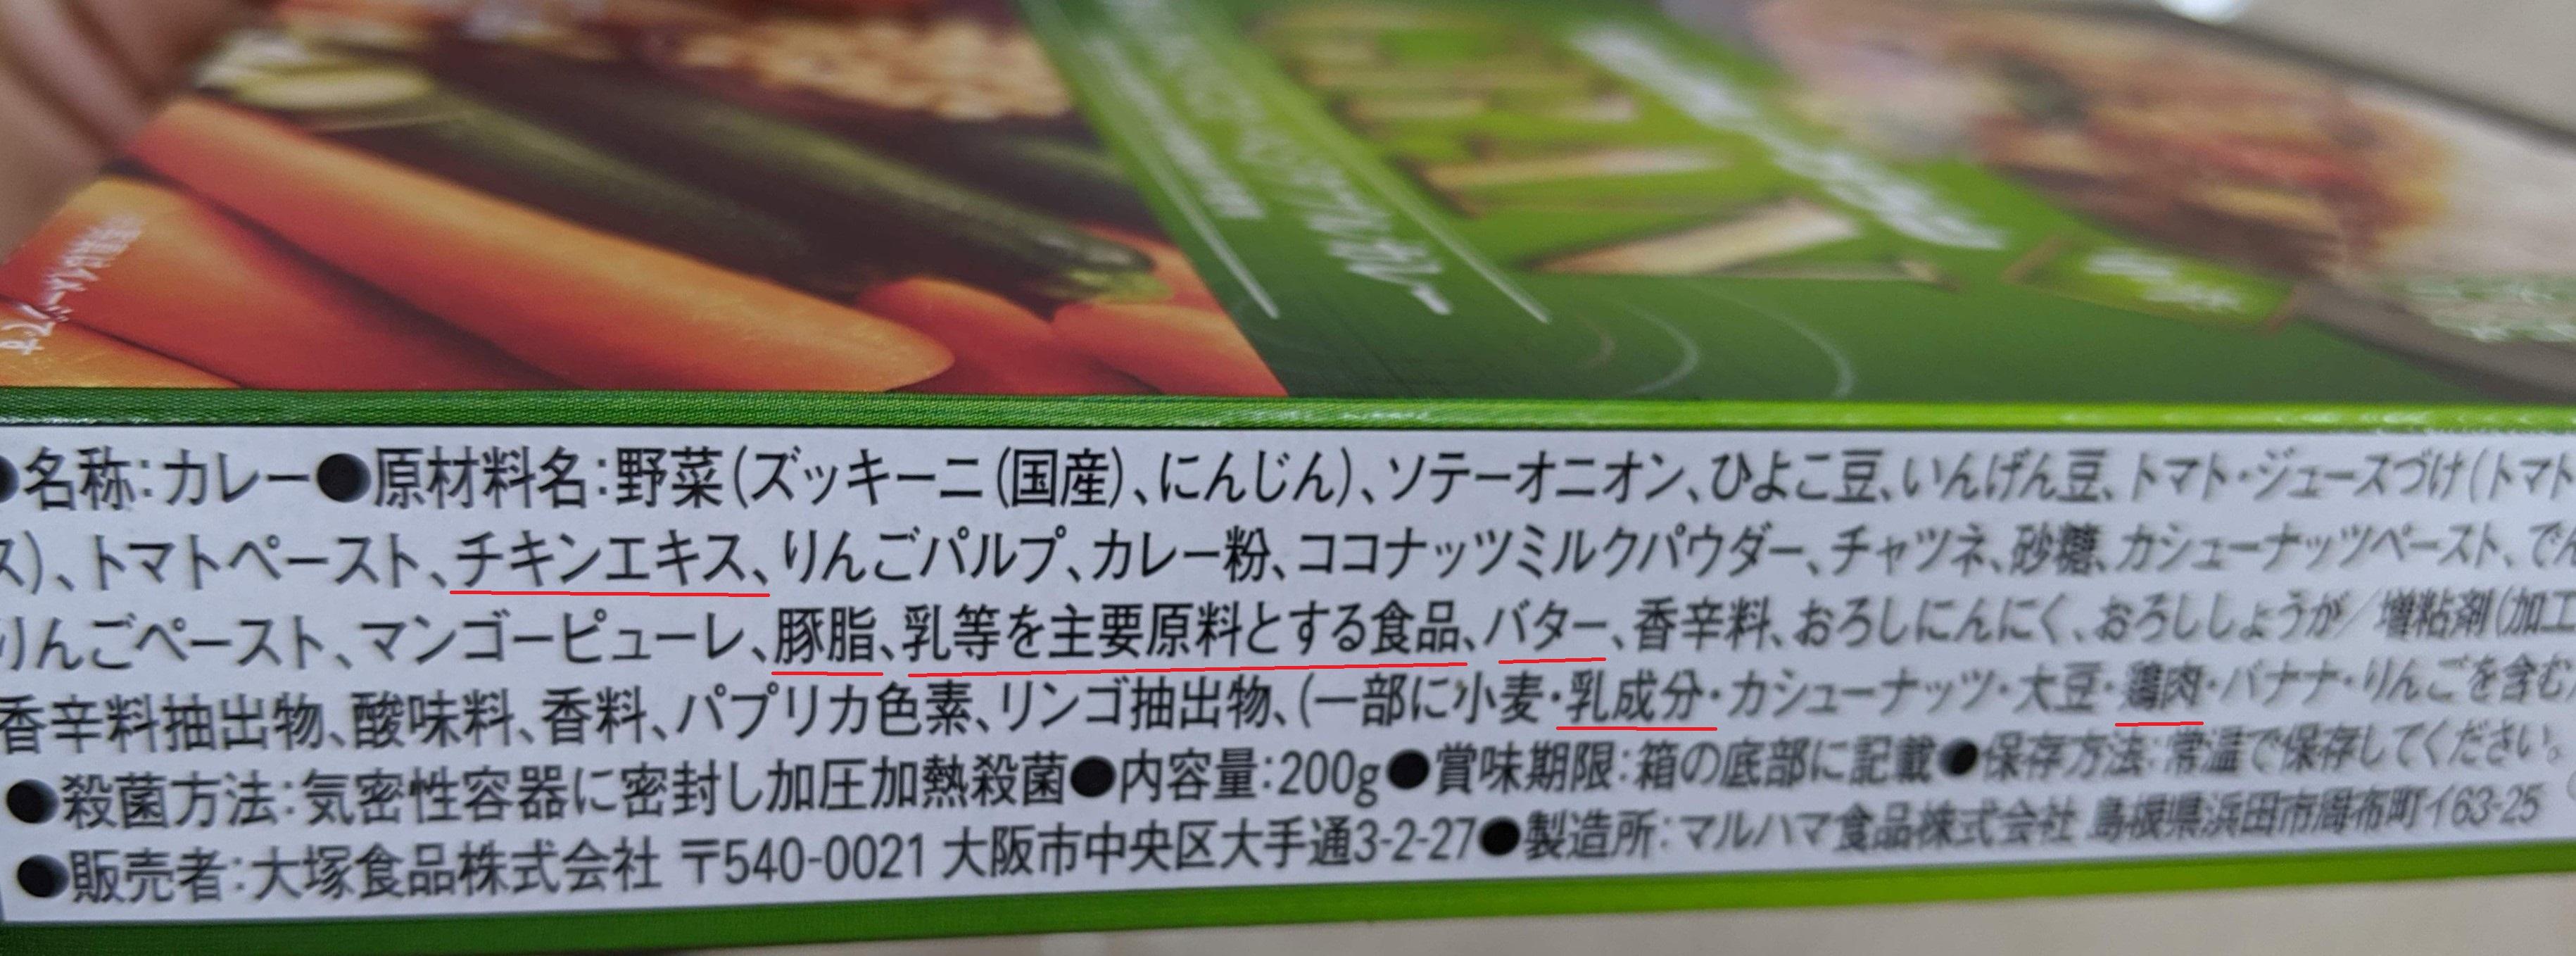 Bon Curry Gran Vegetable ingredients